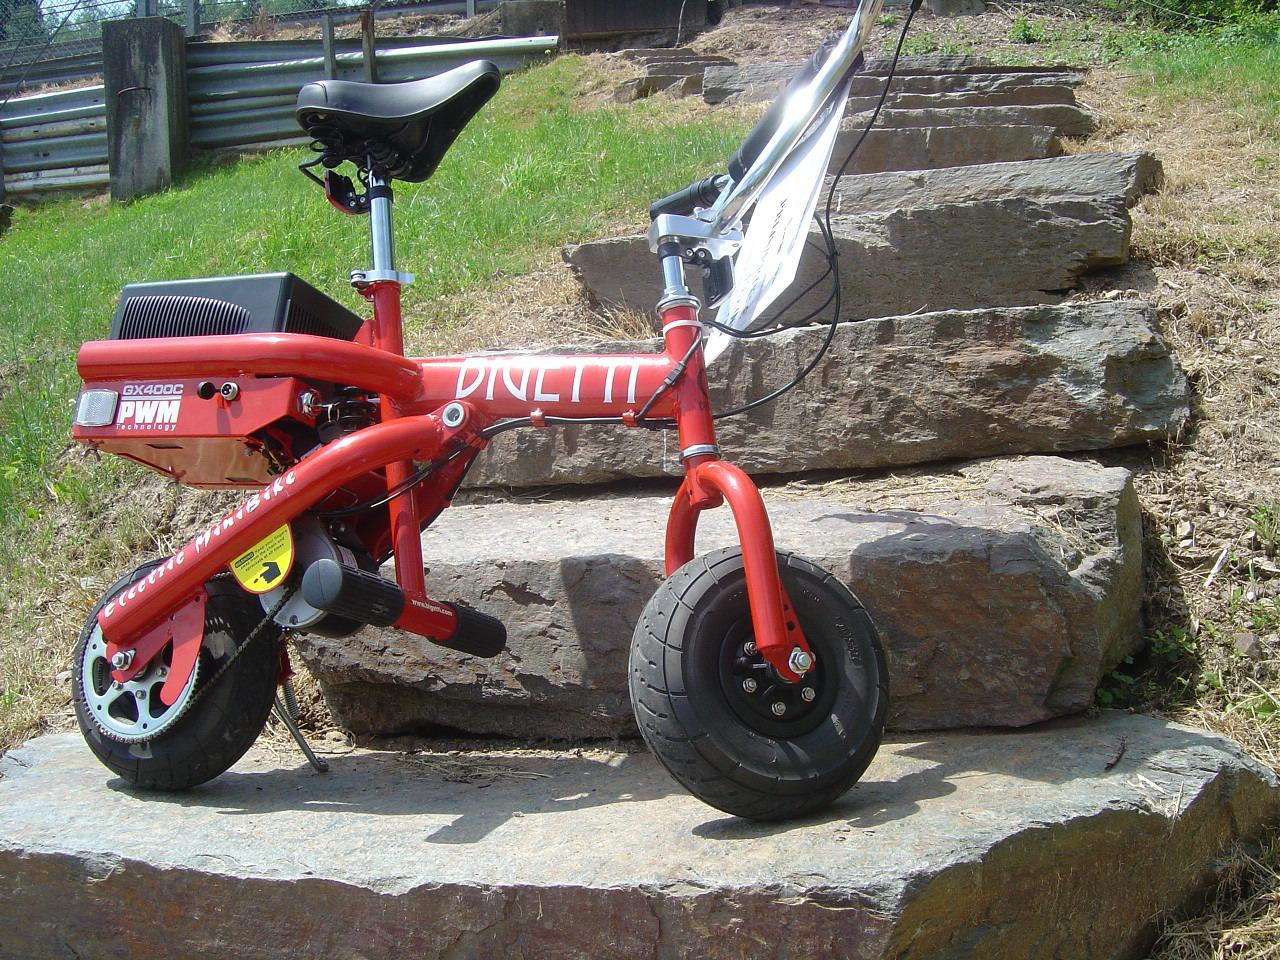 bigetti electric mini bike. Black Bedroom Furniture Sets. Home Design Ideas